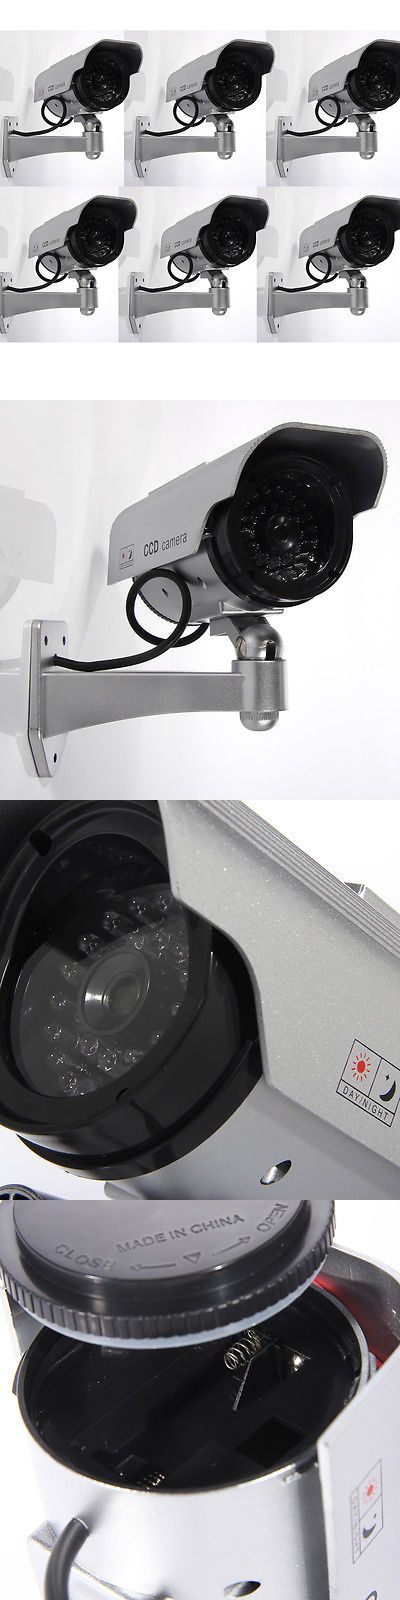 Dummy Cameras: 6Pcs Flashing Light Dummy Security Camera Fake Led Surveillance Solar Power Cctv -> BUY IT NOW ONLY: $43.89 on eBay!